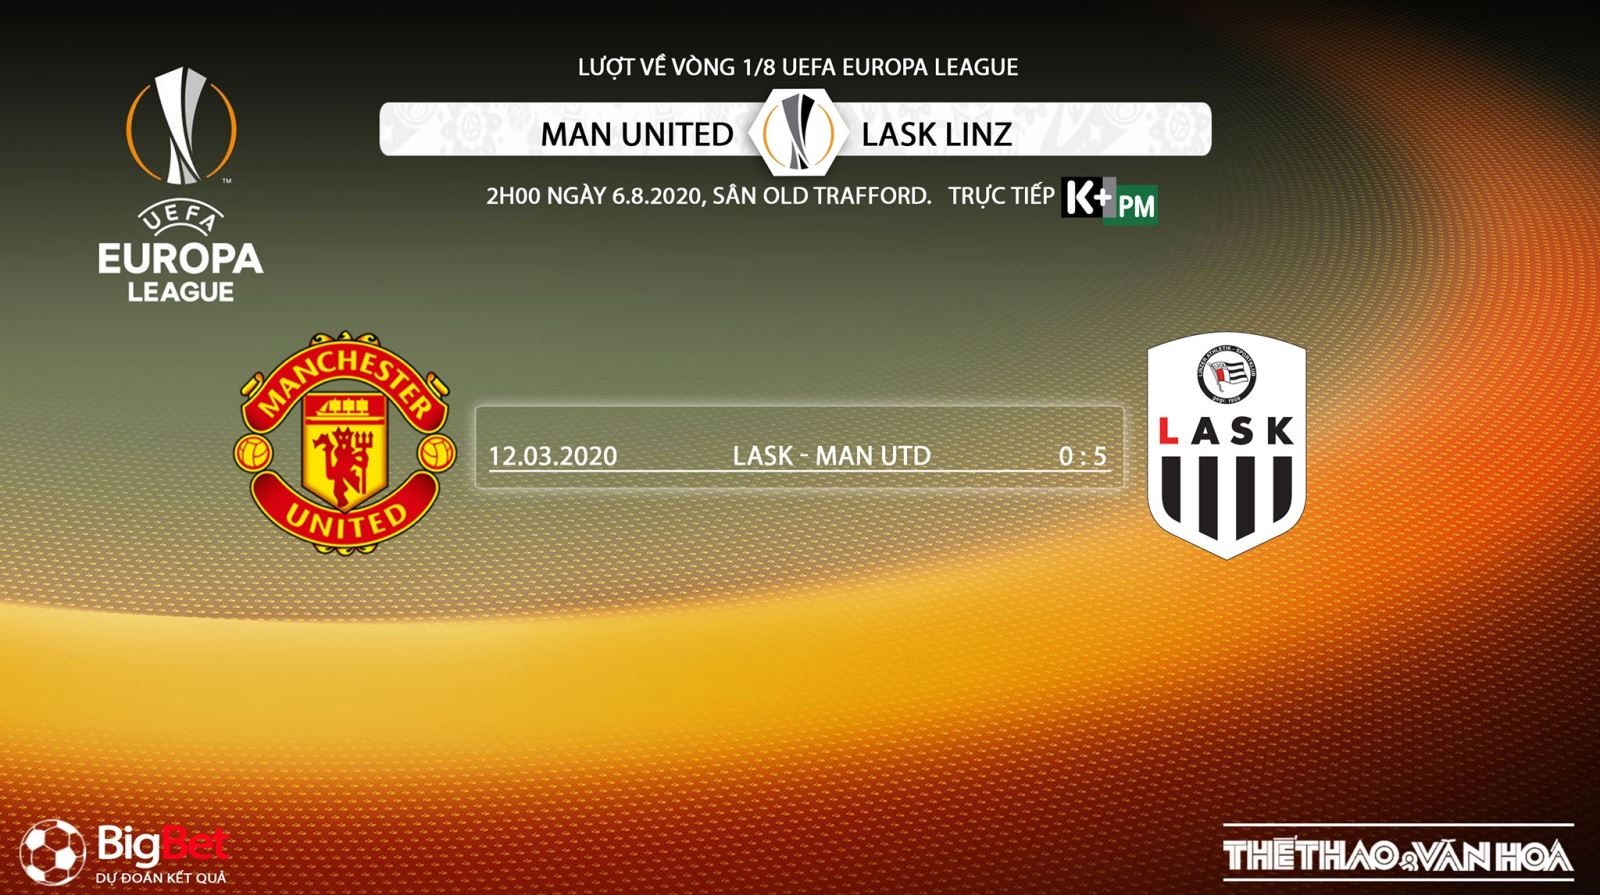 MU vs LASK Linz, MU, LASK Linz, trực tiếp bóng đá, soi kèo MU vs LASK Linz, soi kèo bóng đá, soi kèo, trực tiếp MU vs LASK Linz